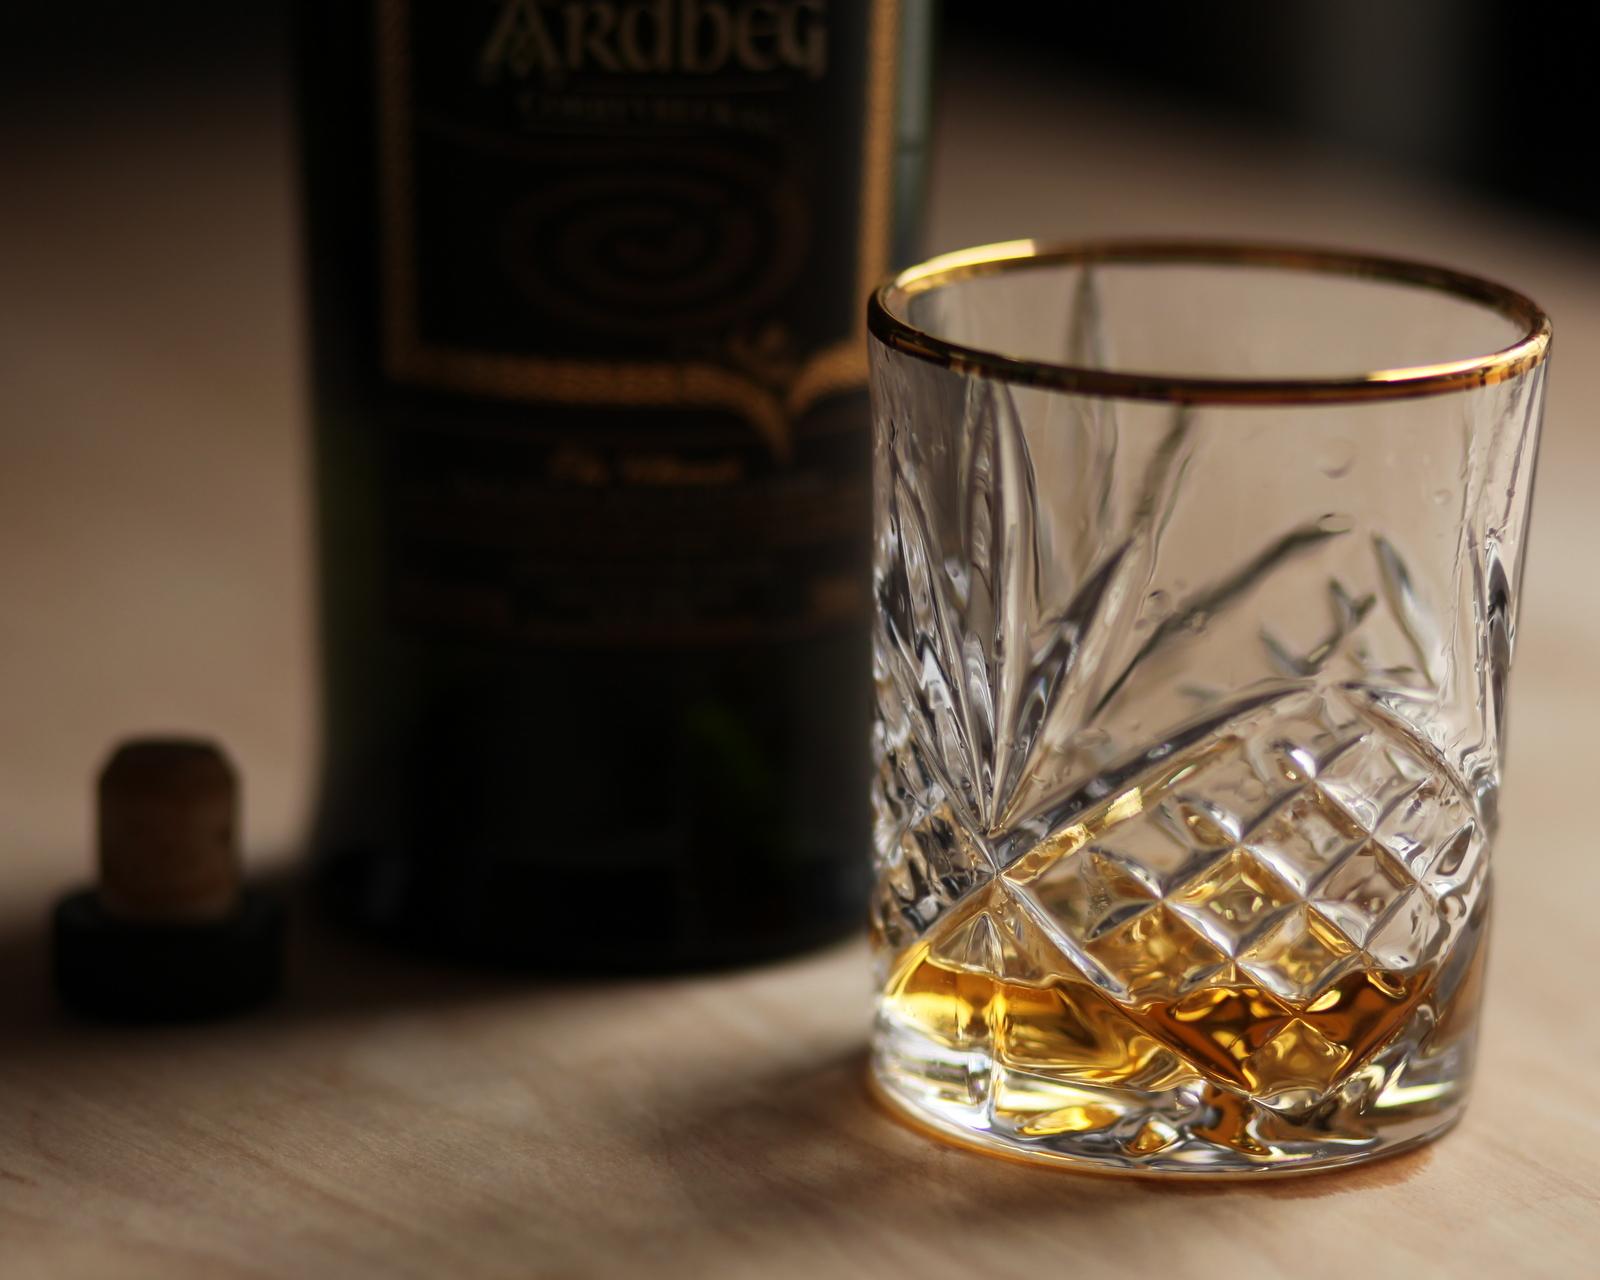 Ardbeg Corryvreckan glass